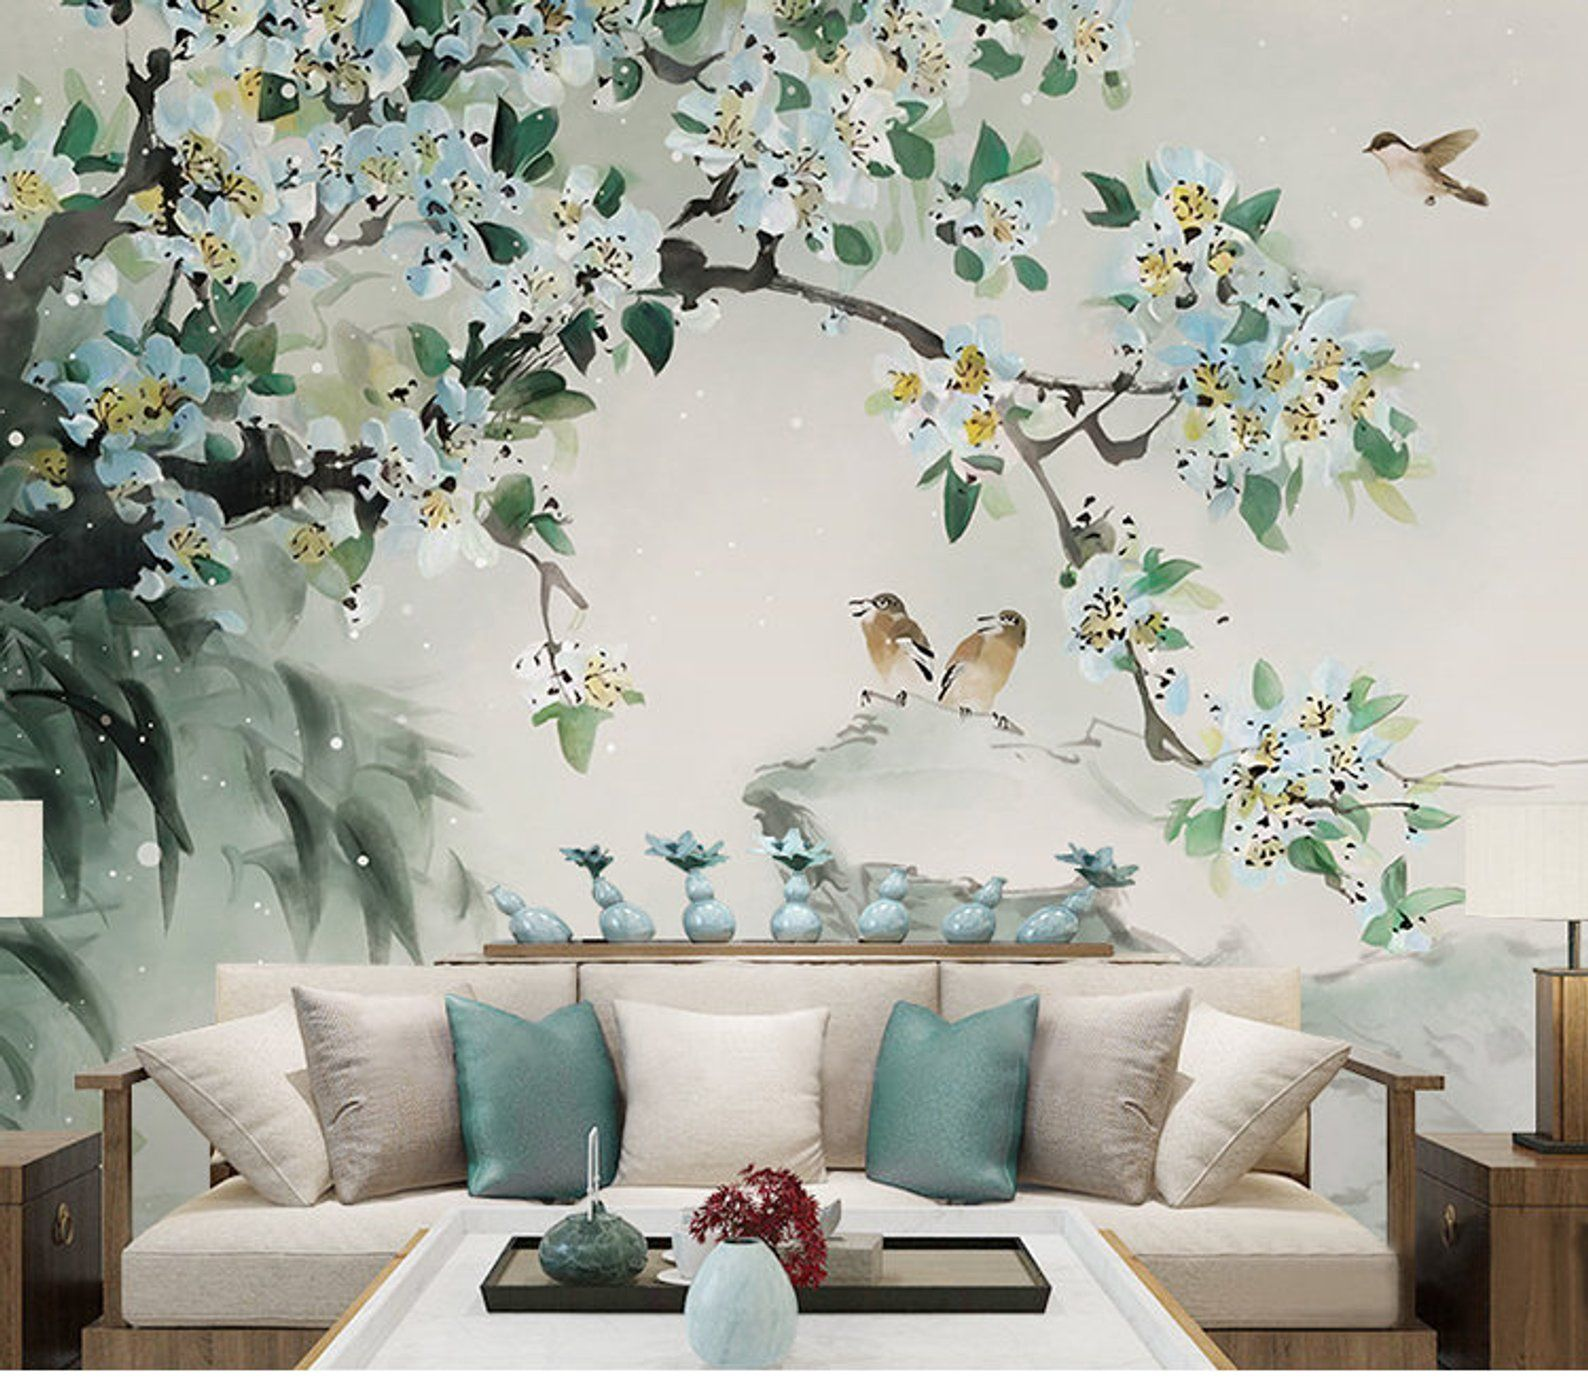 Oriental Ink Painting Wallpaper Wall Mural Flowers Birds Theme